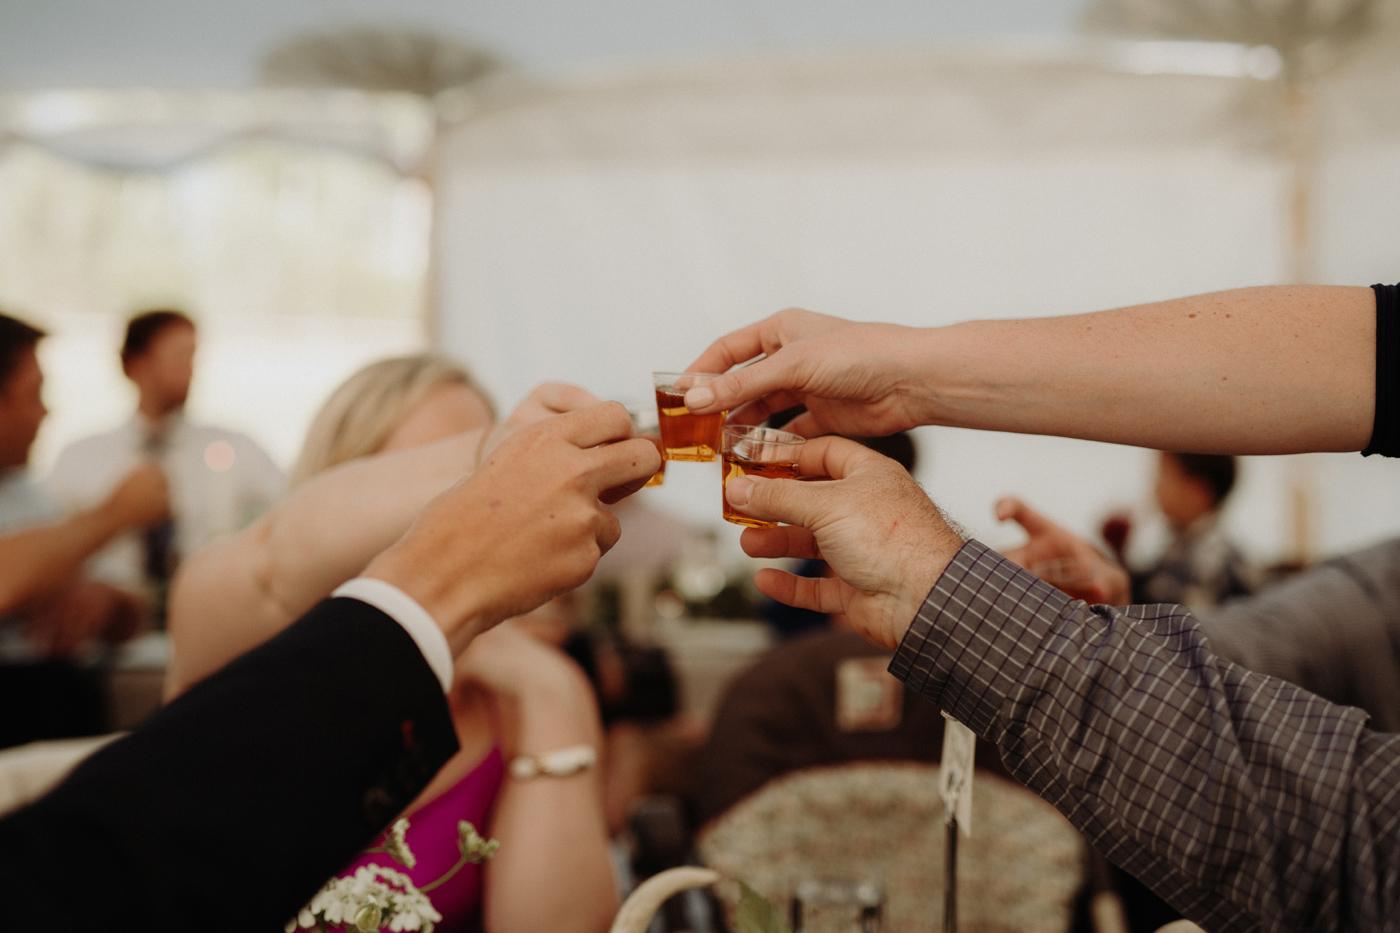 070-grand-teton-jackson-hole-wyoming-wedding.jpg